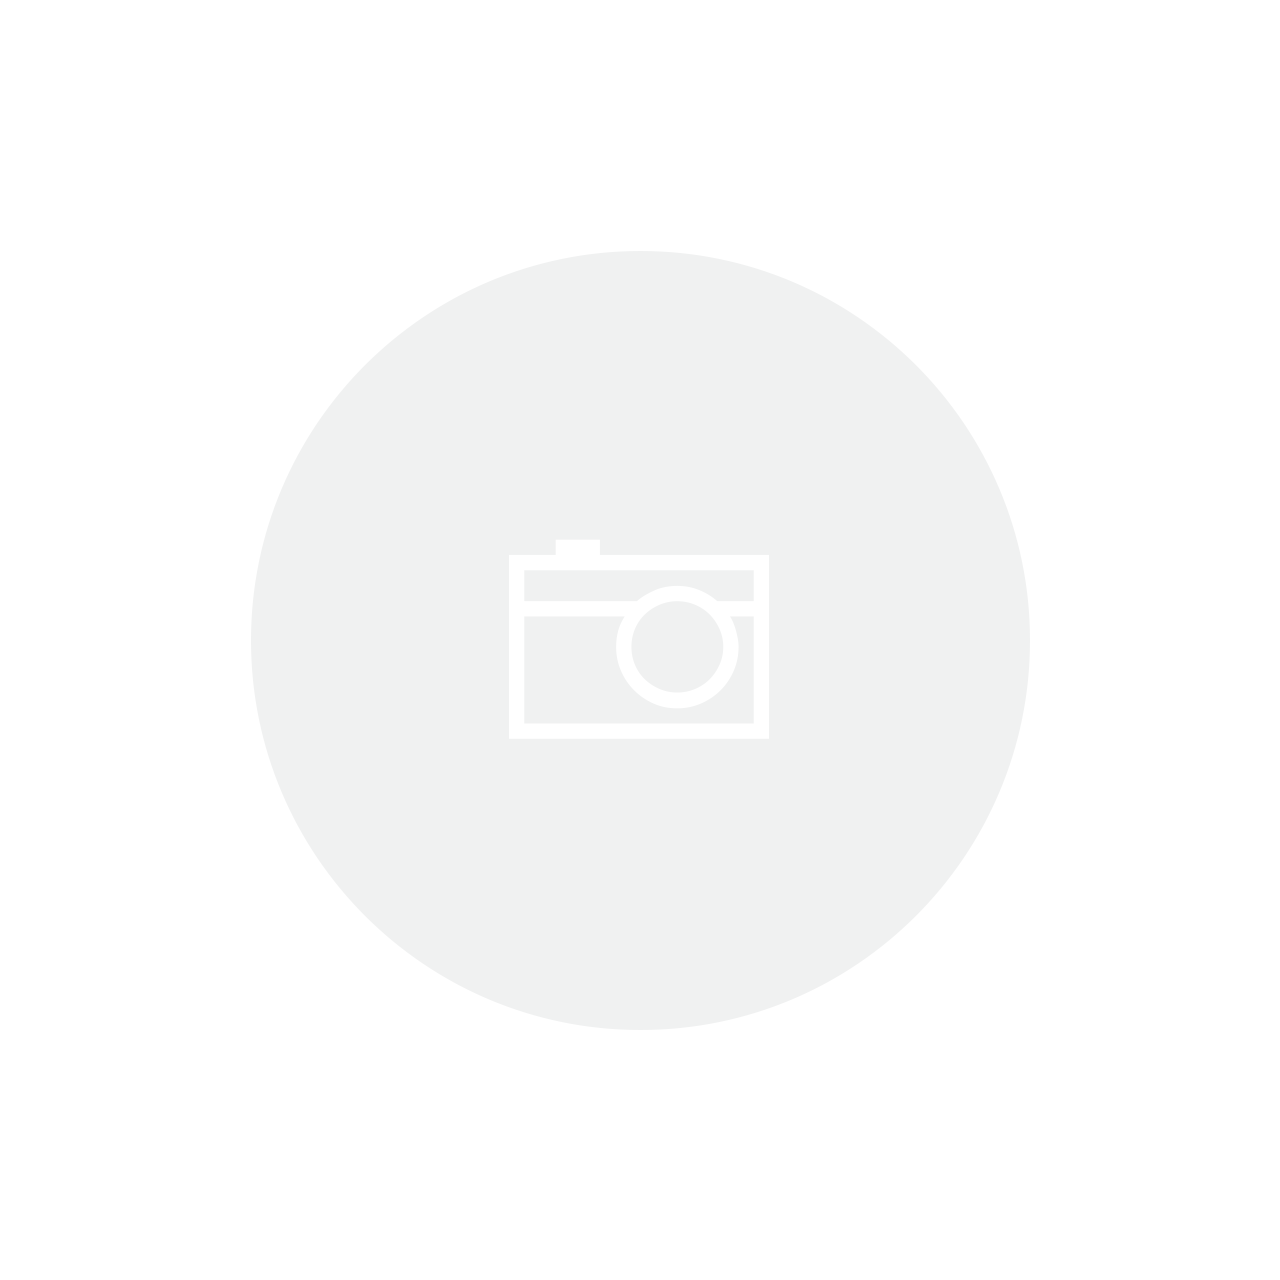 Panela Inox 16cm 1,40 Litros Duo Silicone Tramontina